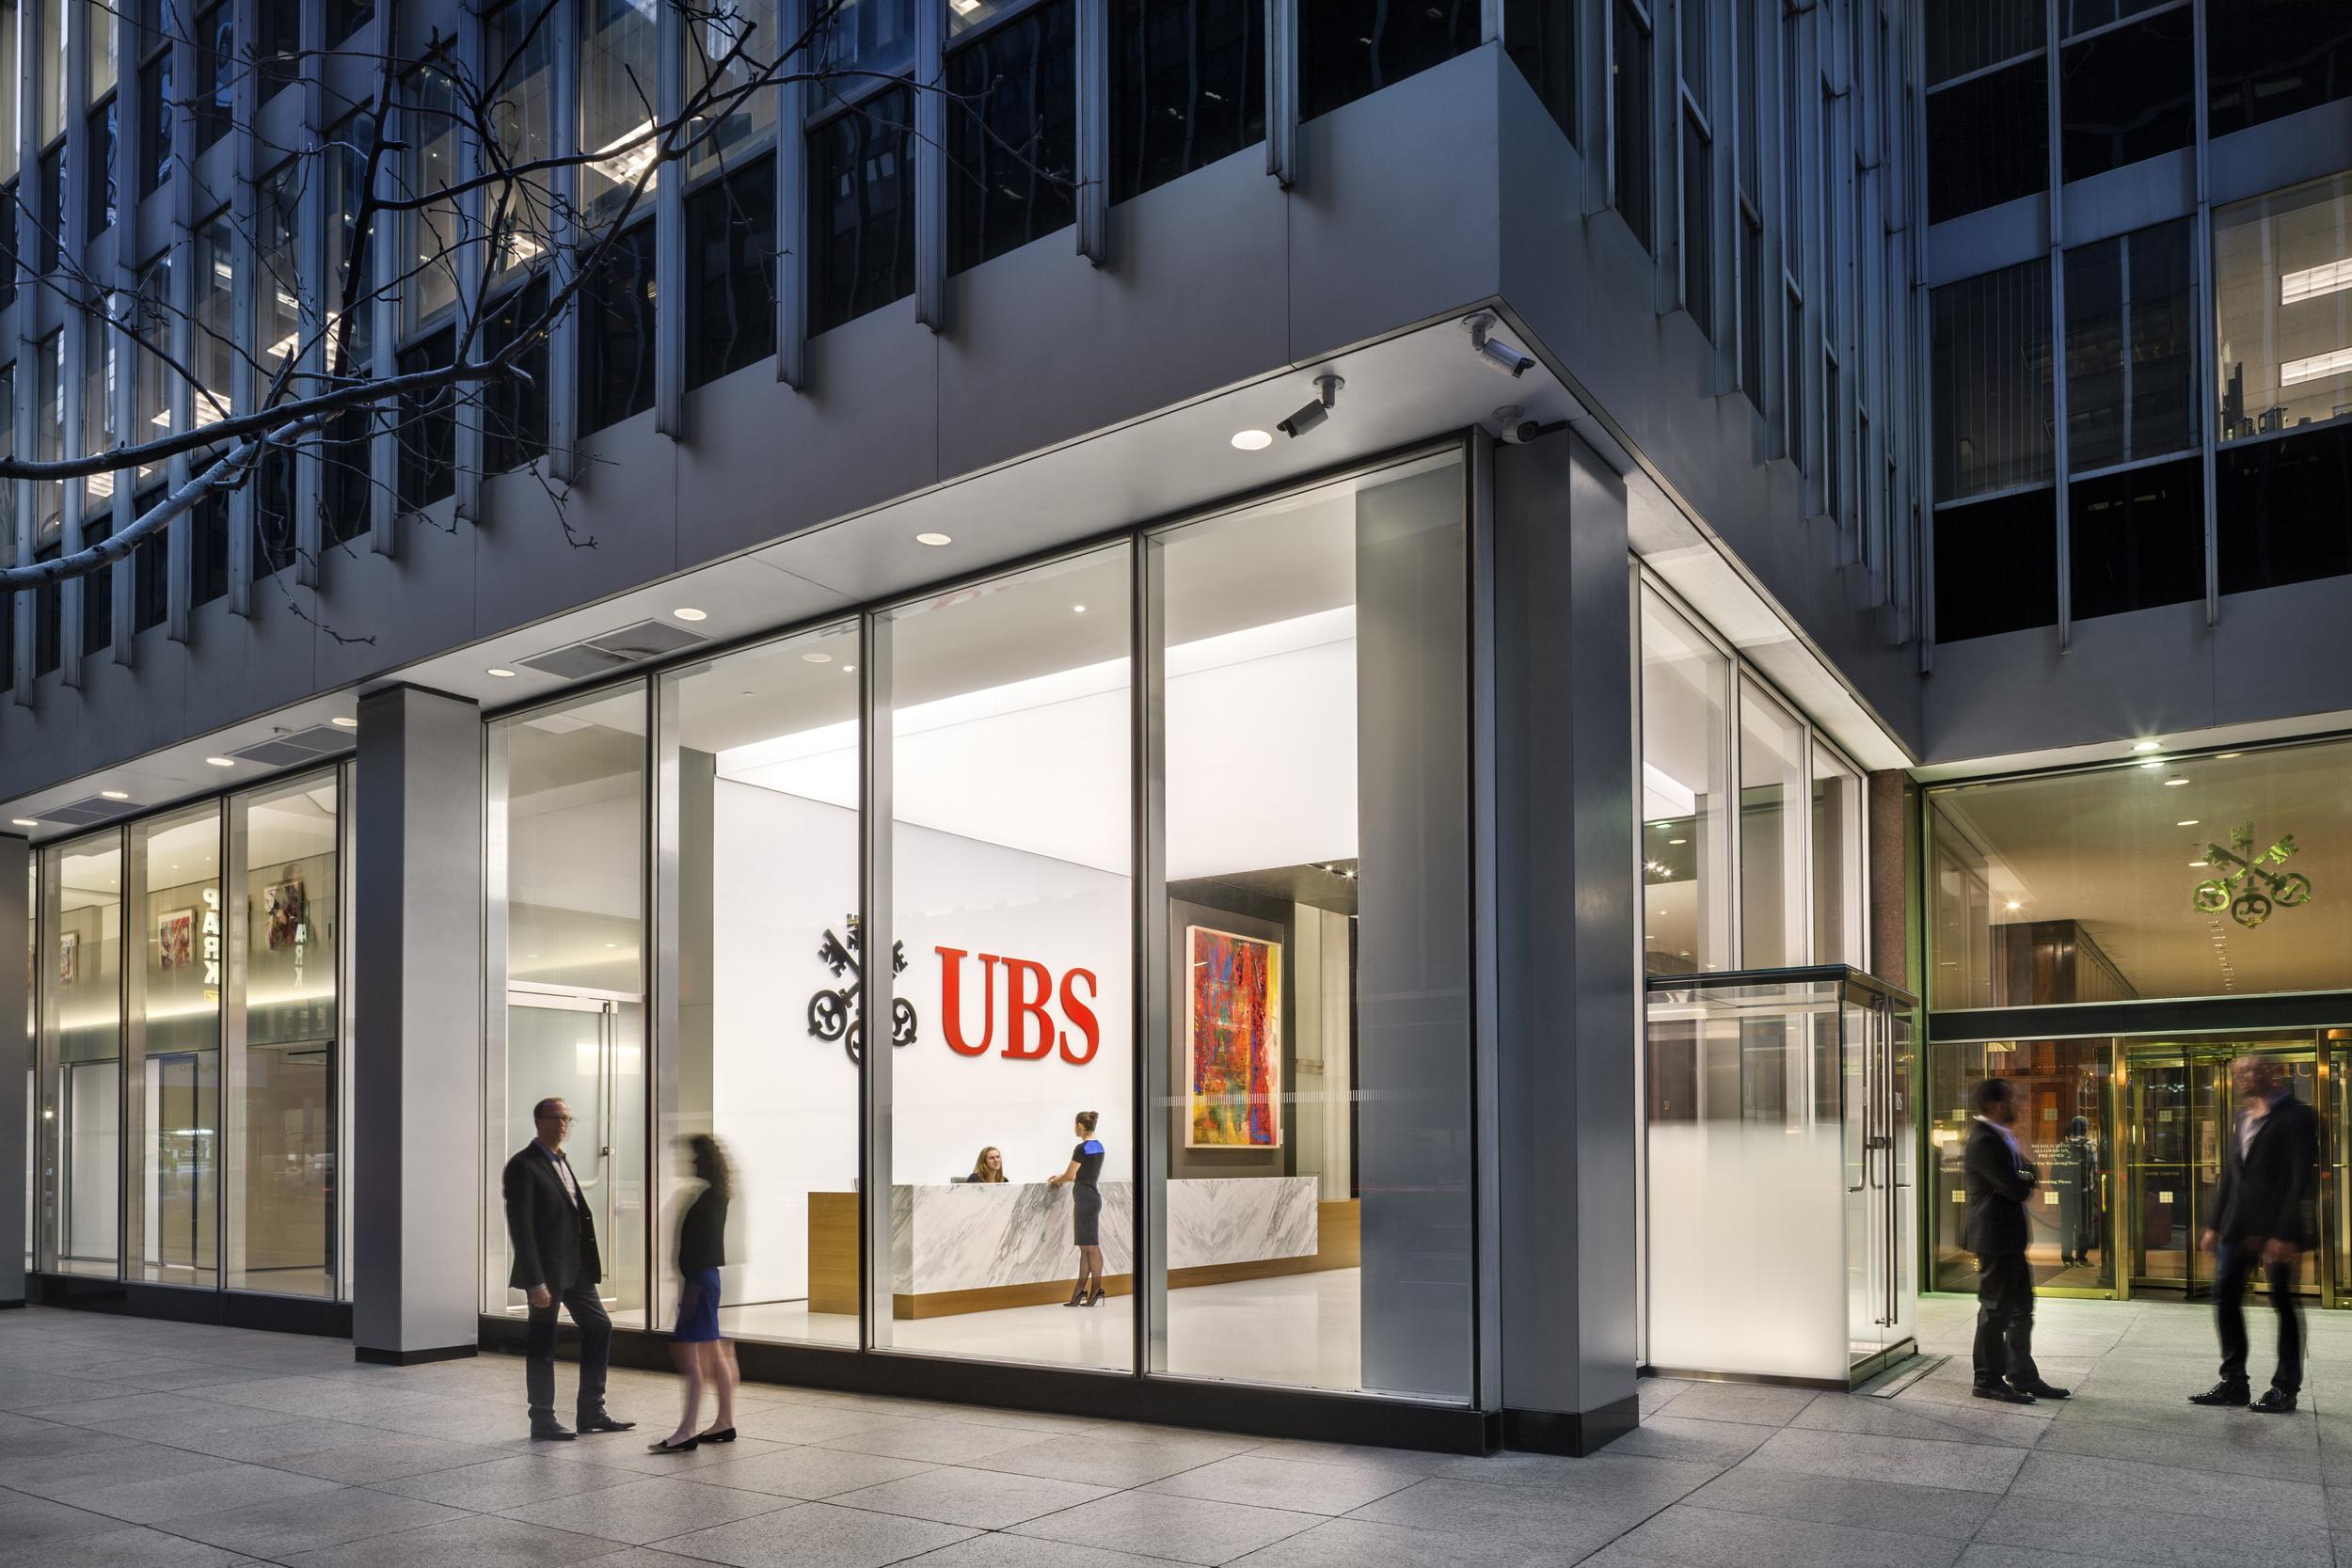 HIPNY_UBS Welcome Center_20140919_01.jpg